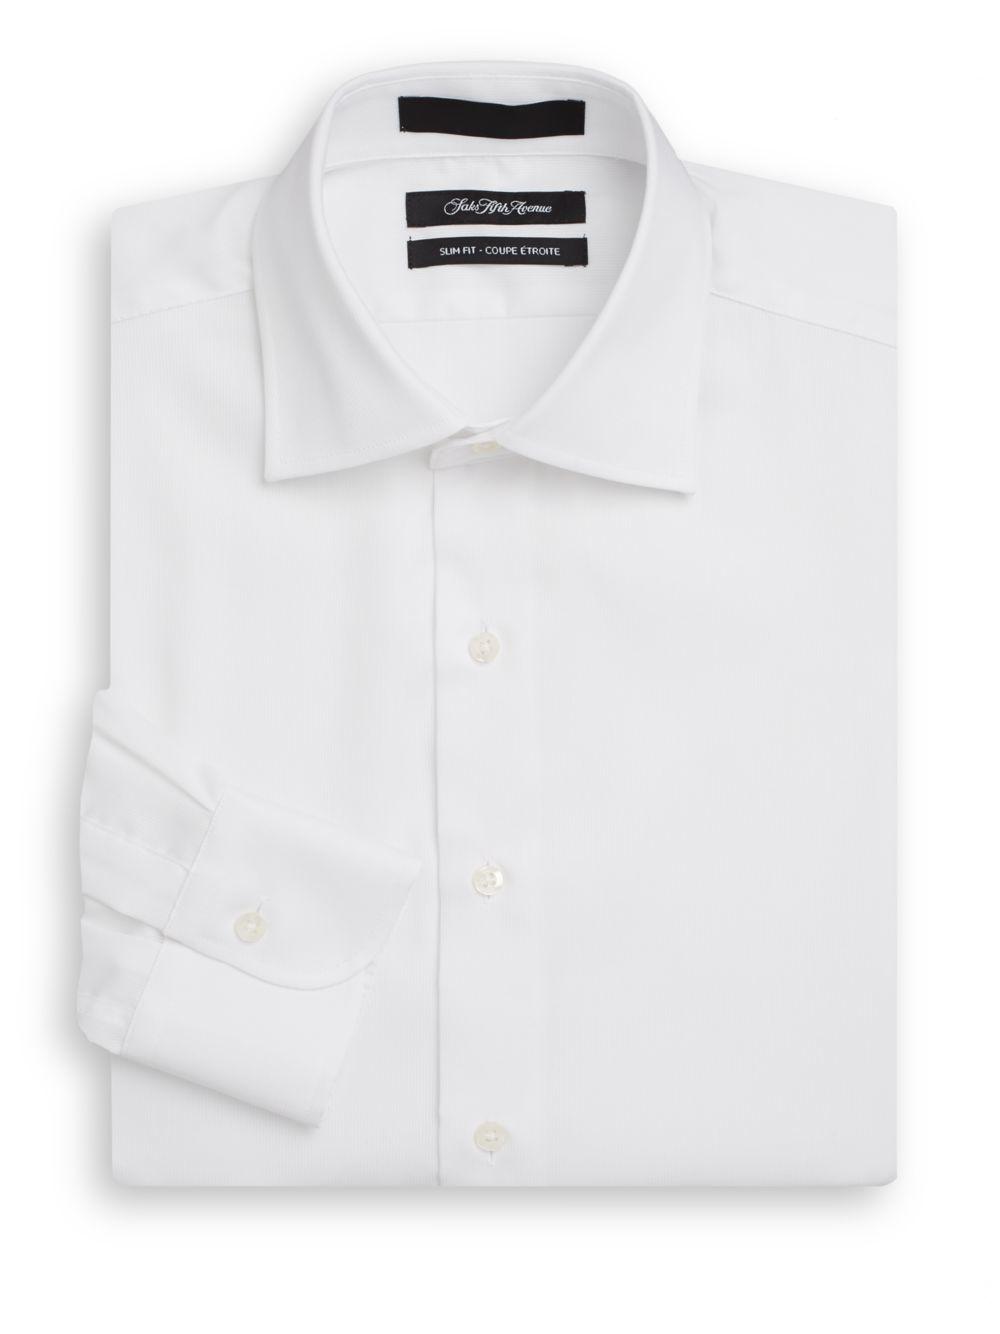 Saks fifth avenue slim fit herringbone cotton dress shirt for White herringbone dress shirt